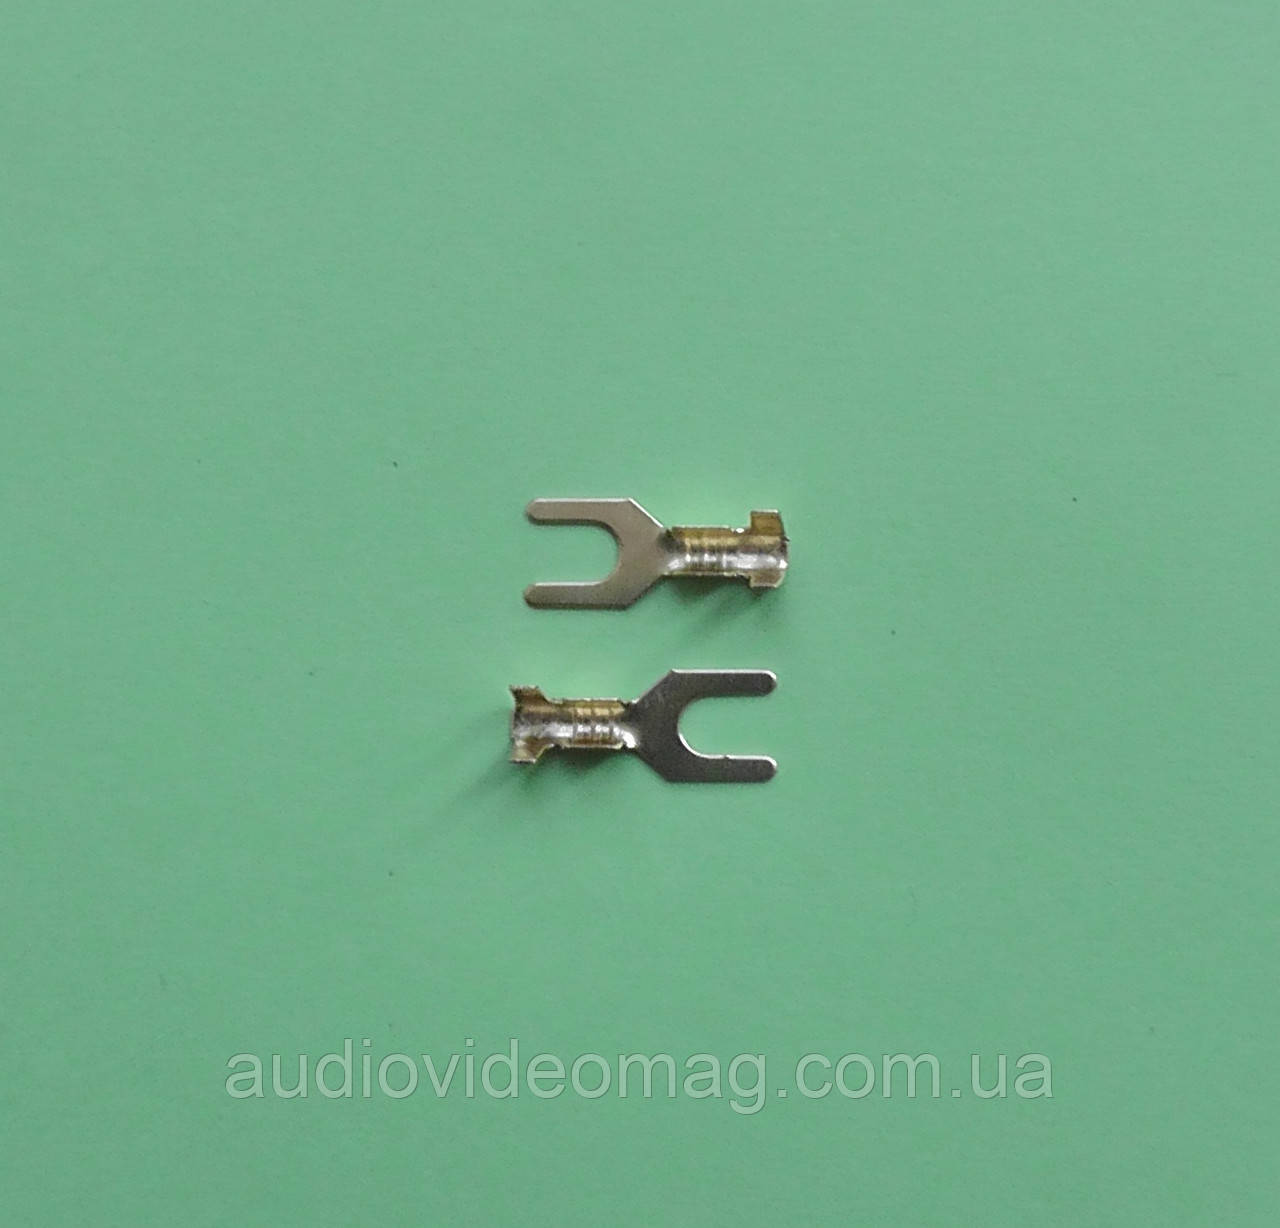 Клемма вилочная под контакт 3 мм , упаковка 50 шт.